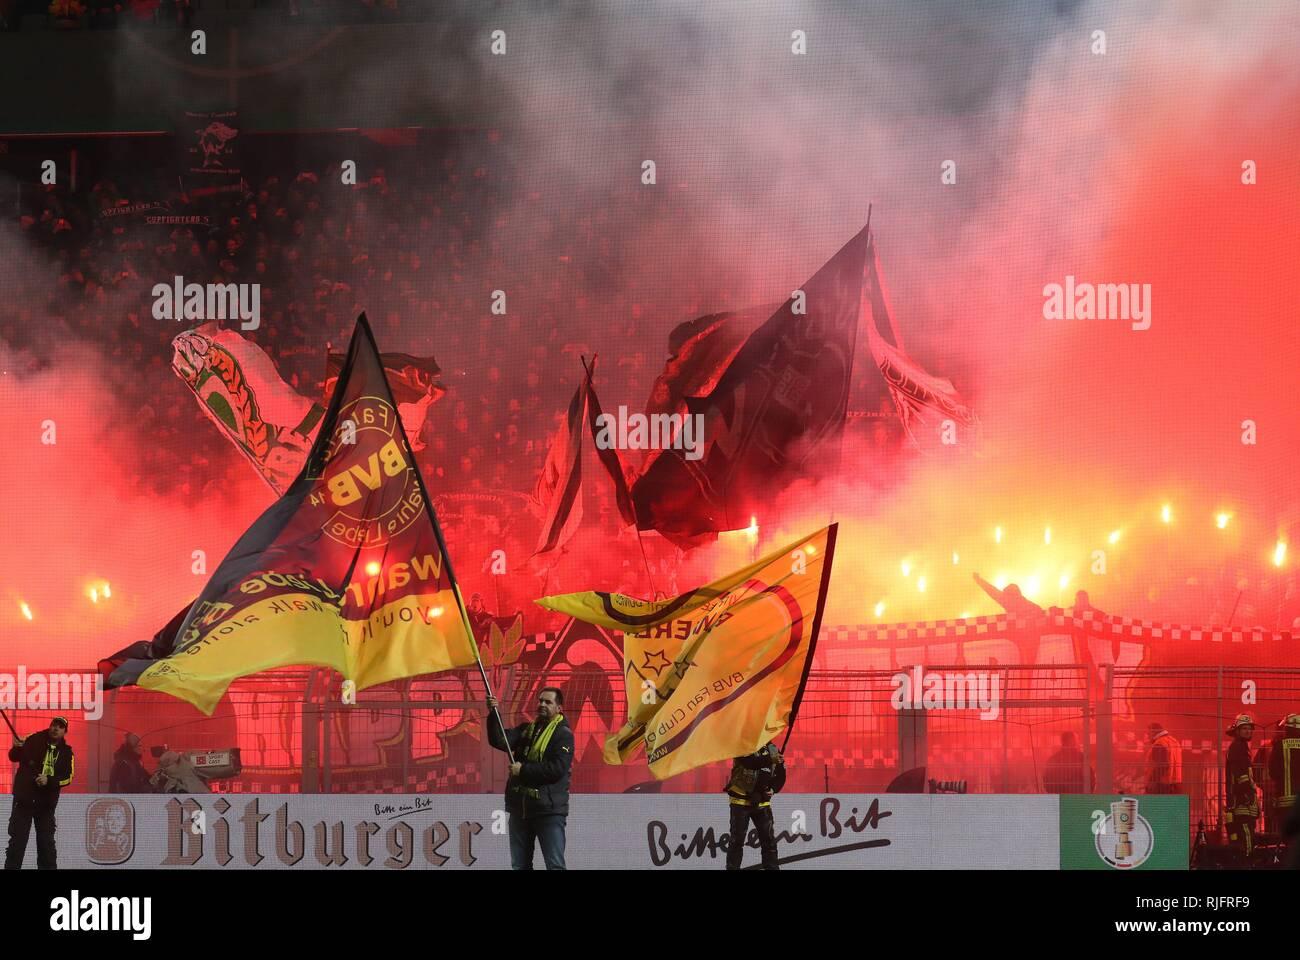 firo: Fuvuball ,, season 2018/2019 DFB-Pokal, cup, 05.02.2019 BVB Borussia Dortmund - SV Werder Bremen fans werder pyrotechnics   usage worldwide - Stock Image